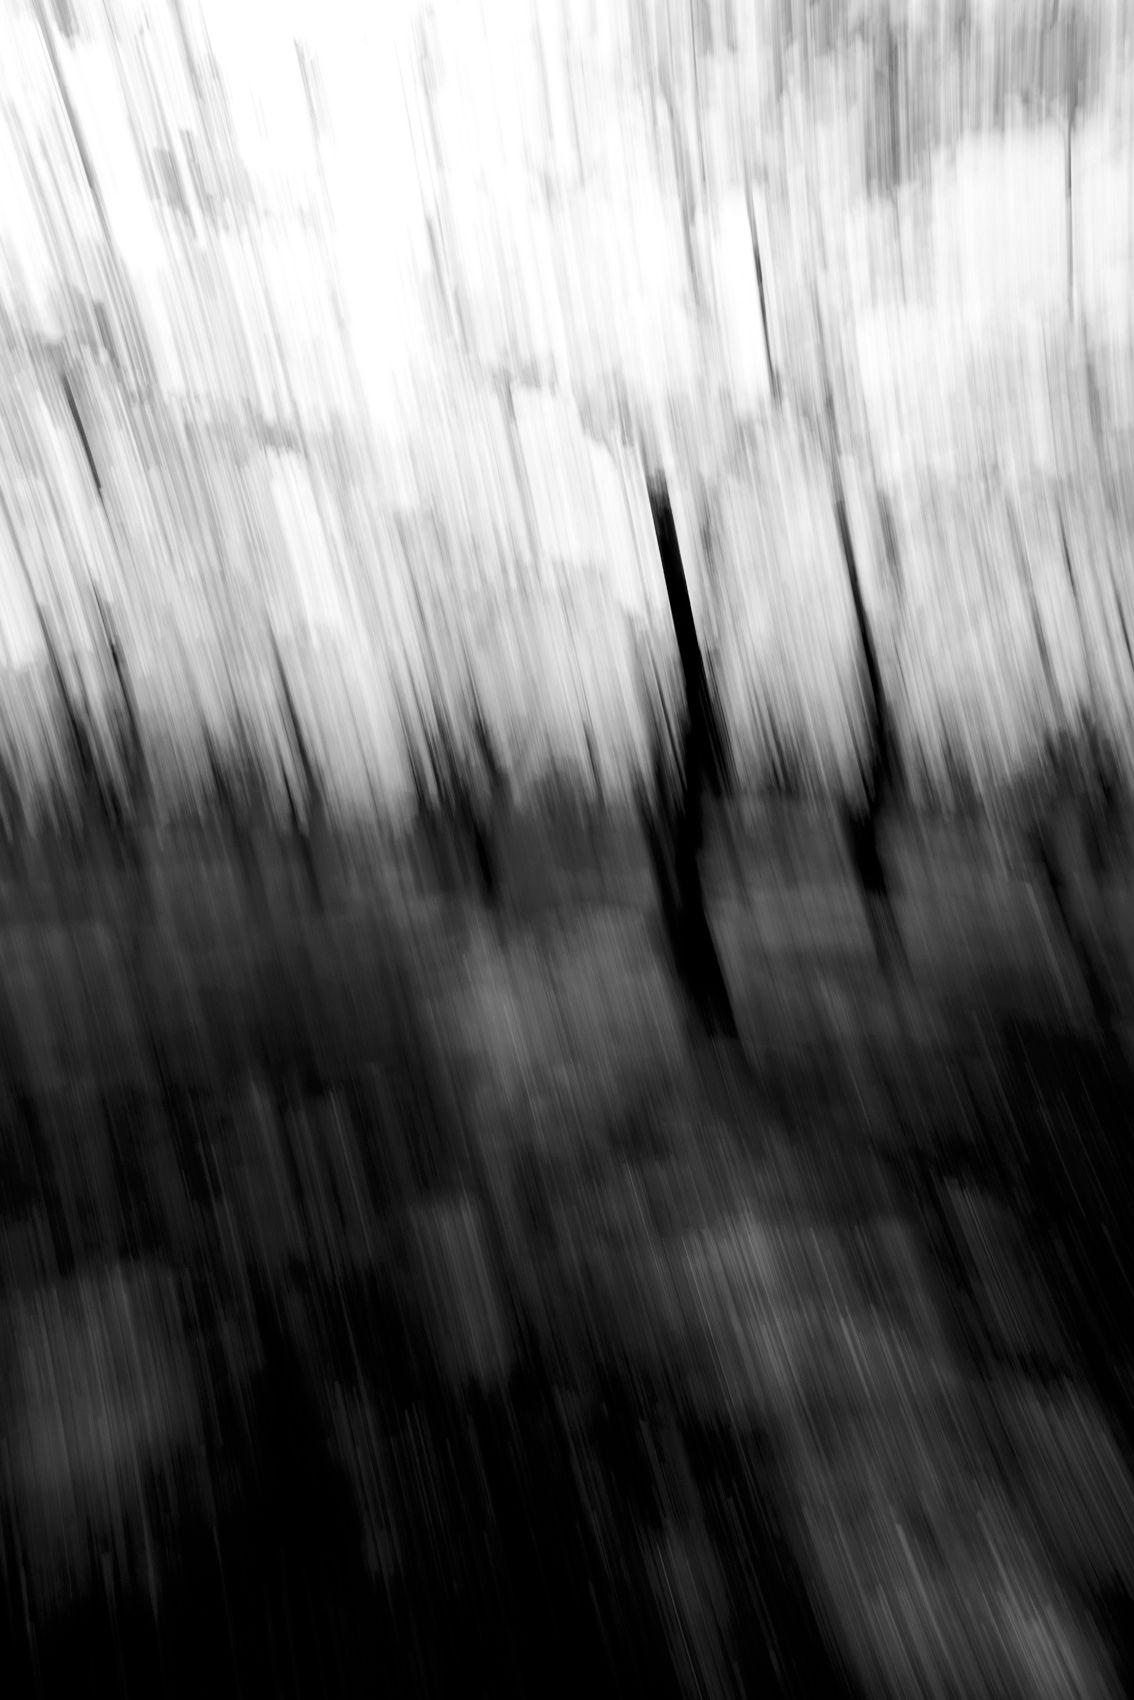 CherryBlossoms.Blur. 67.jpg